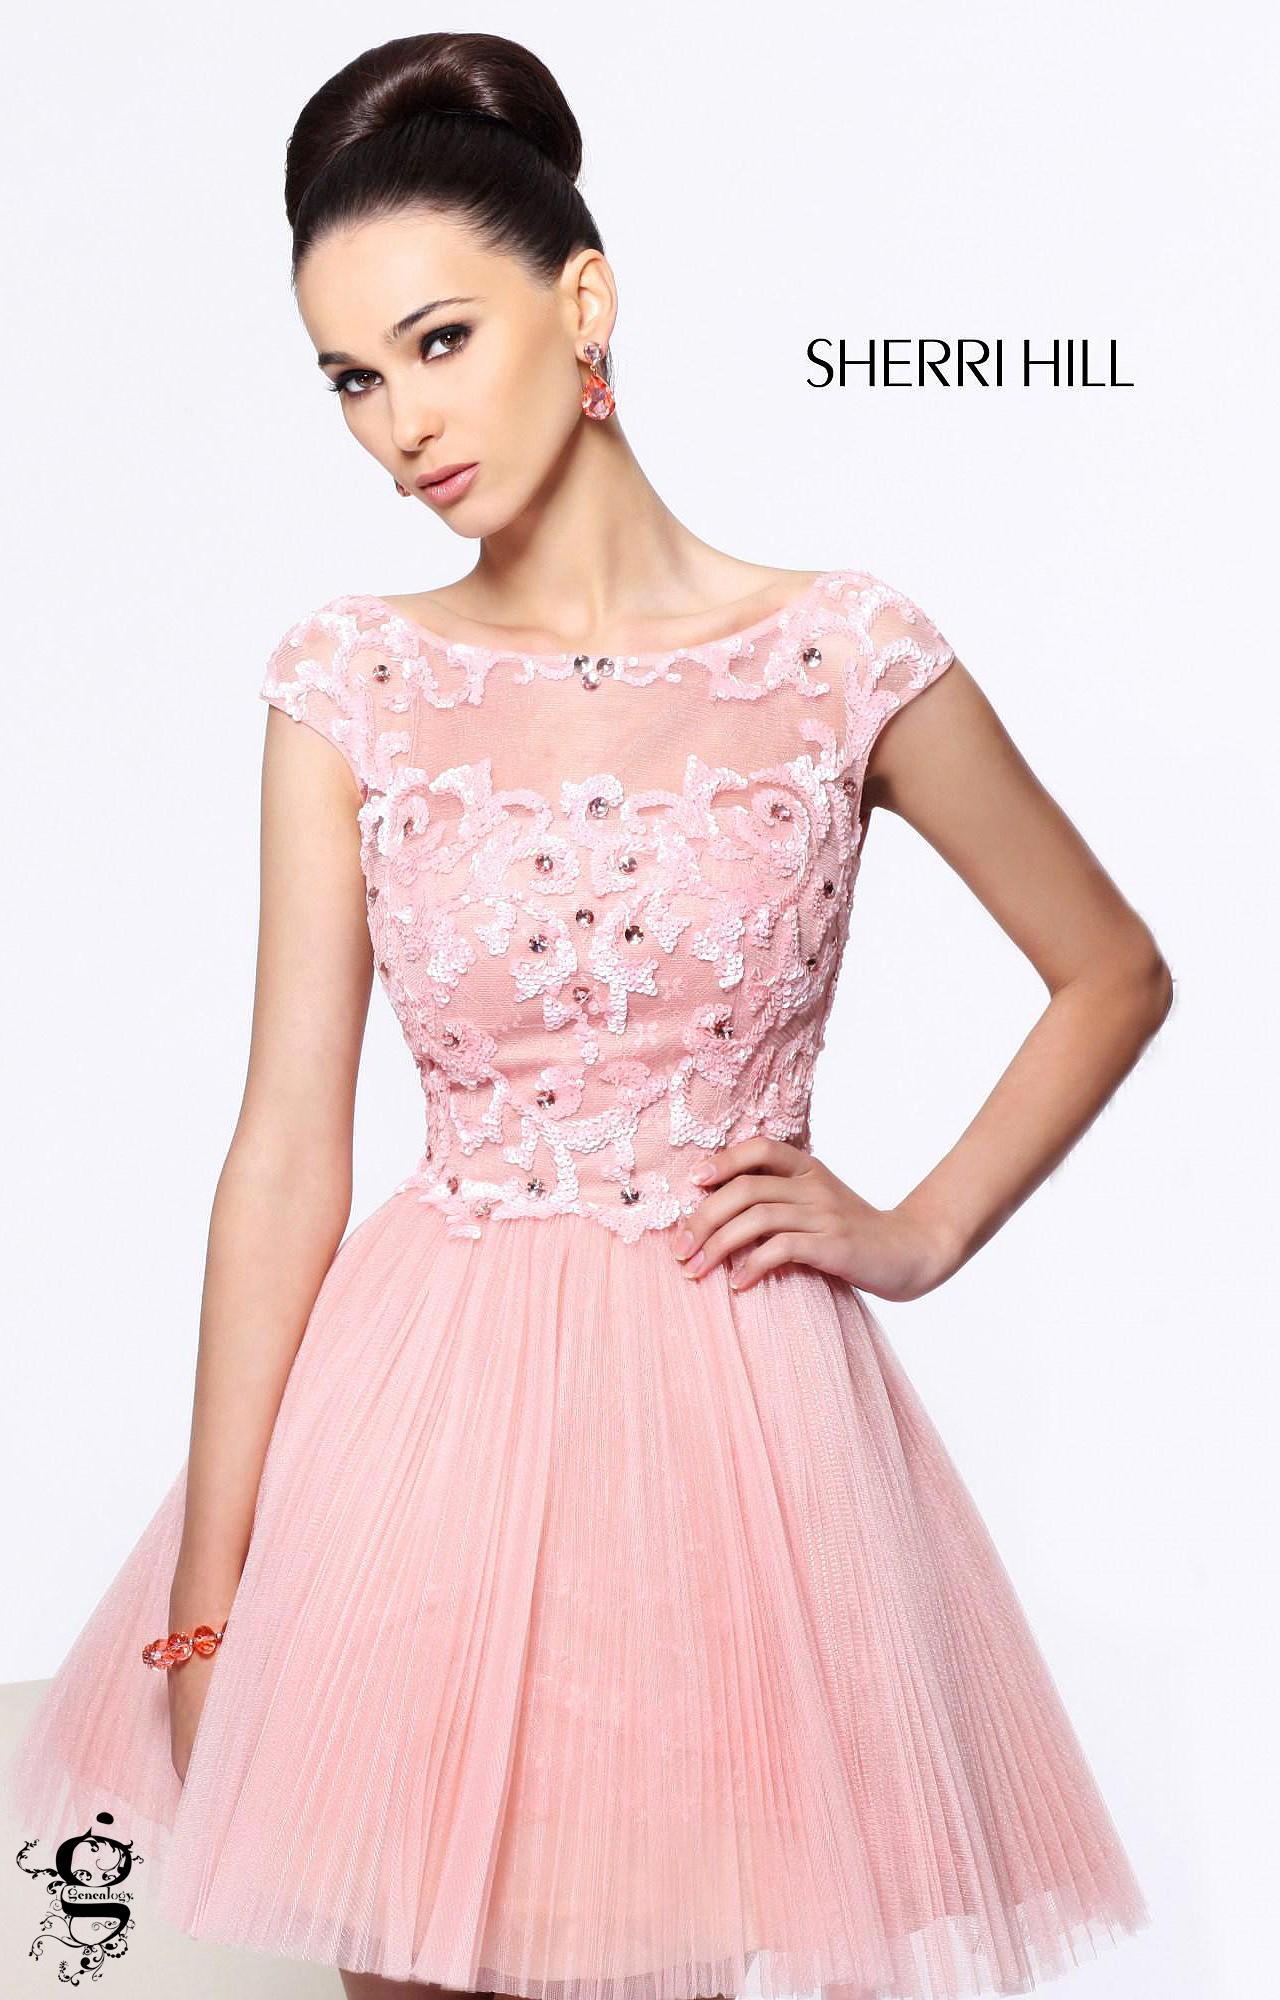 Sherri Hill 21032 - Cap Sleeve Short Tulle Dress Prom Dress